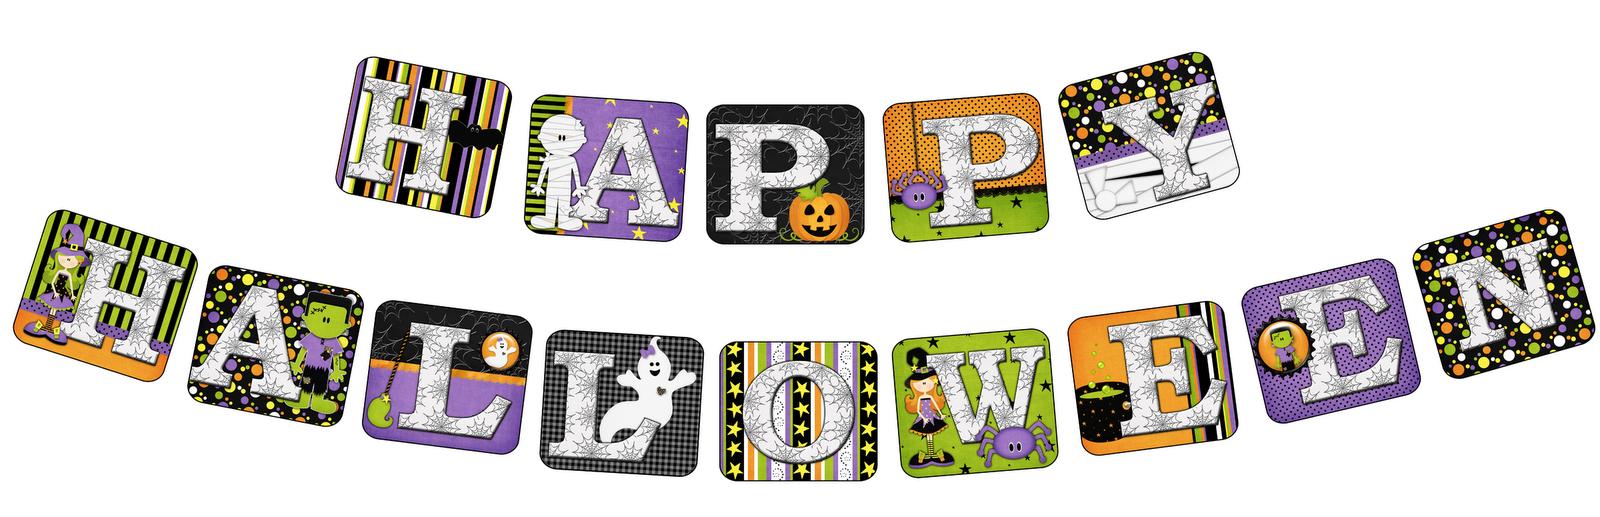 Printable Banners Templates Free   Yvonne Byatt's Family Fun: Free - Free Printable Halloween Banner Templates